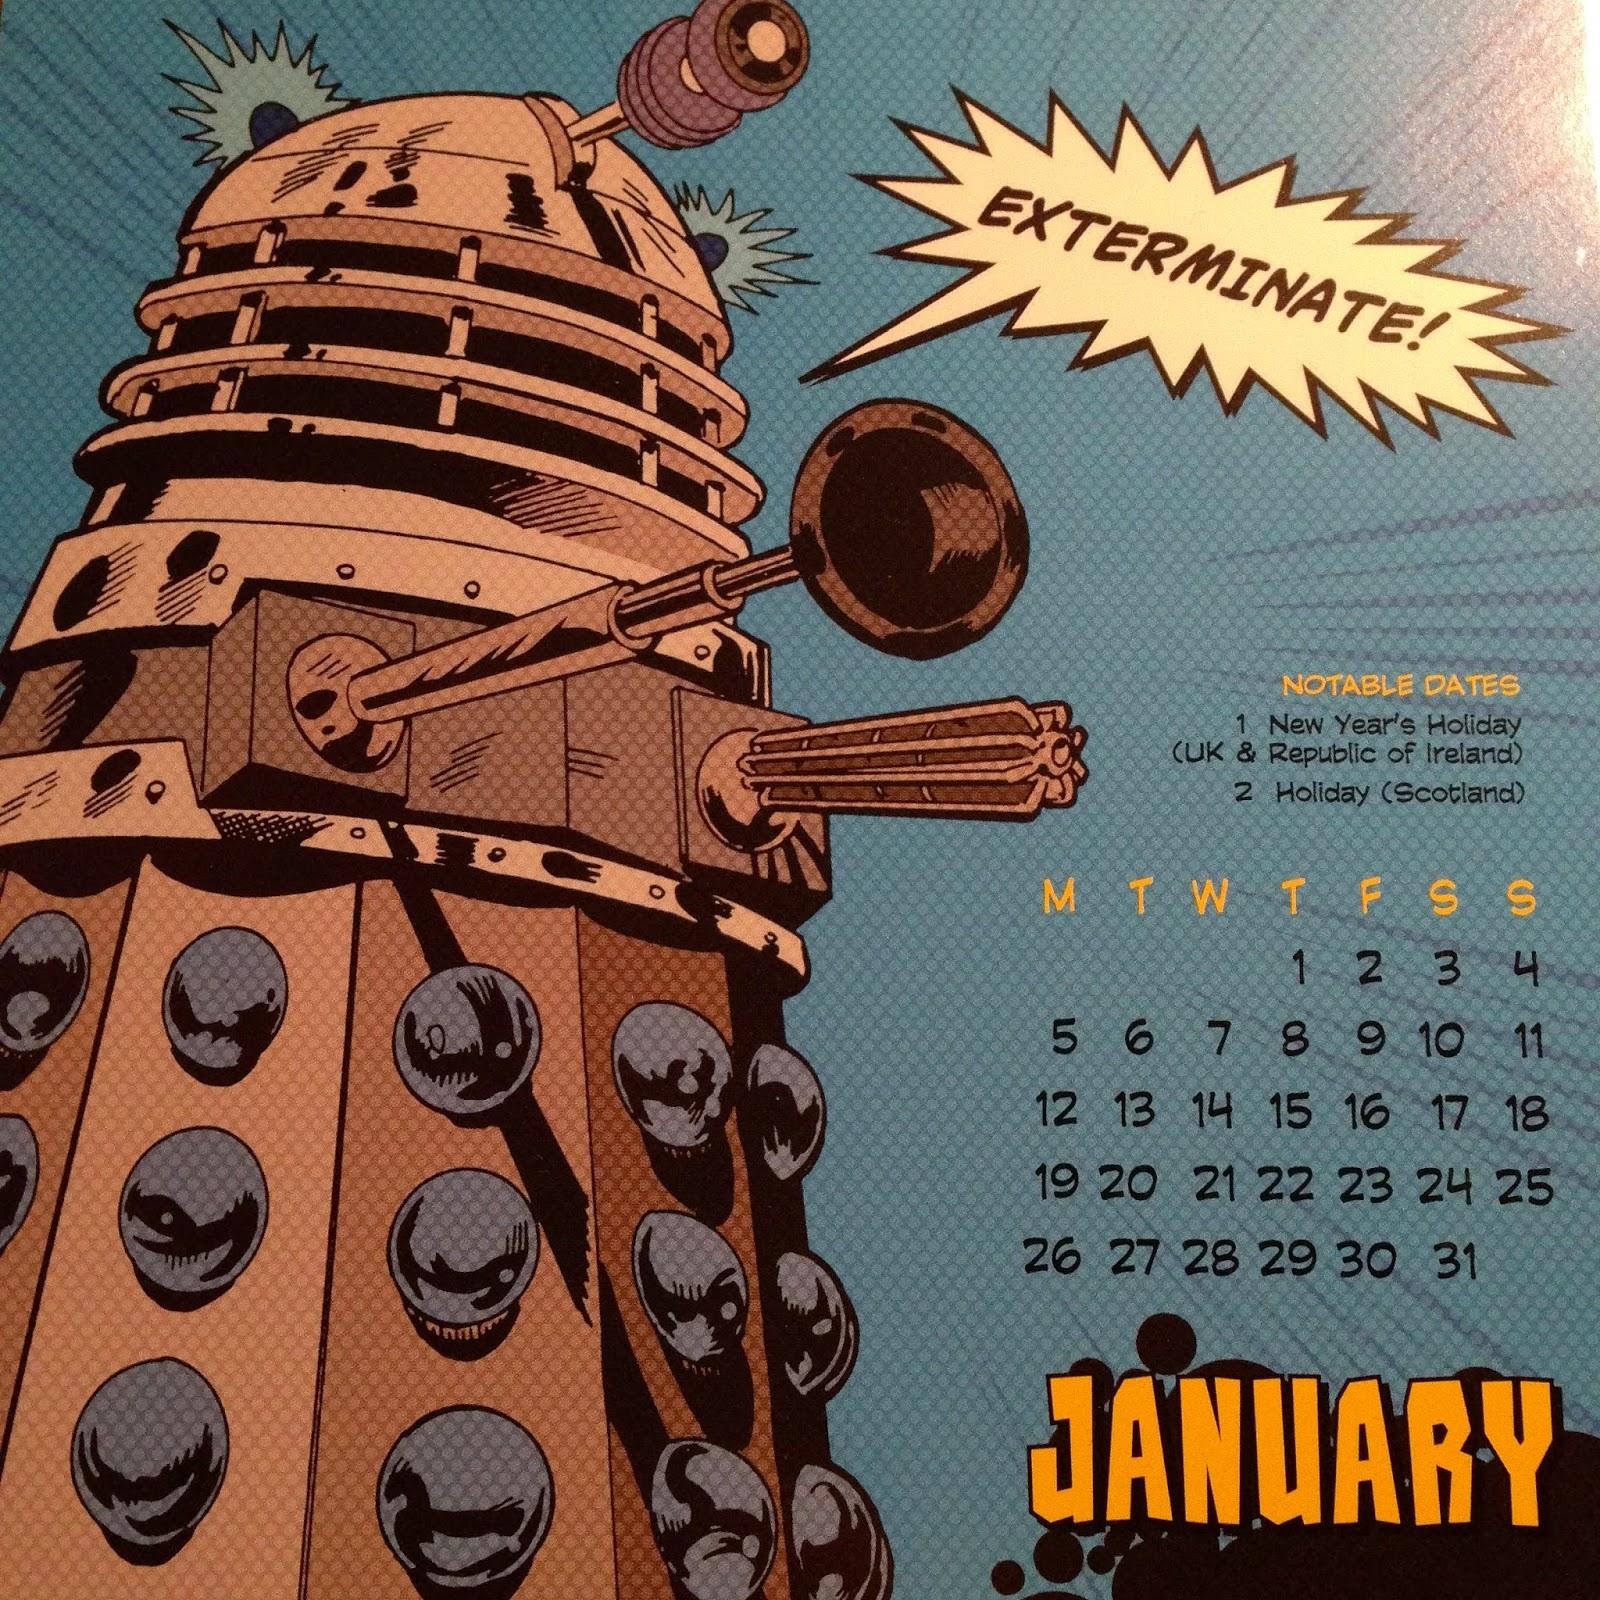 Doctor Who Desk Calendar 2015 January